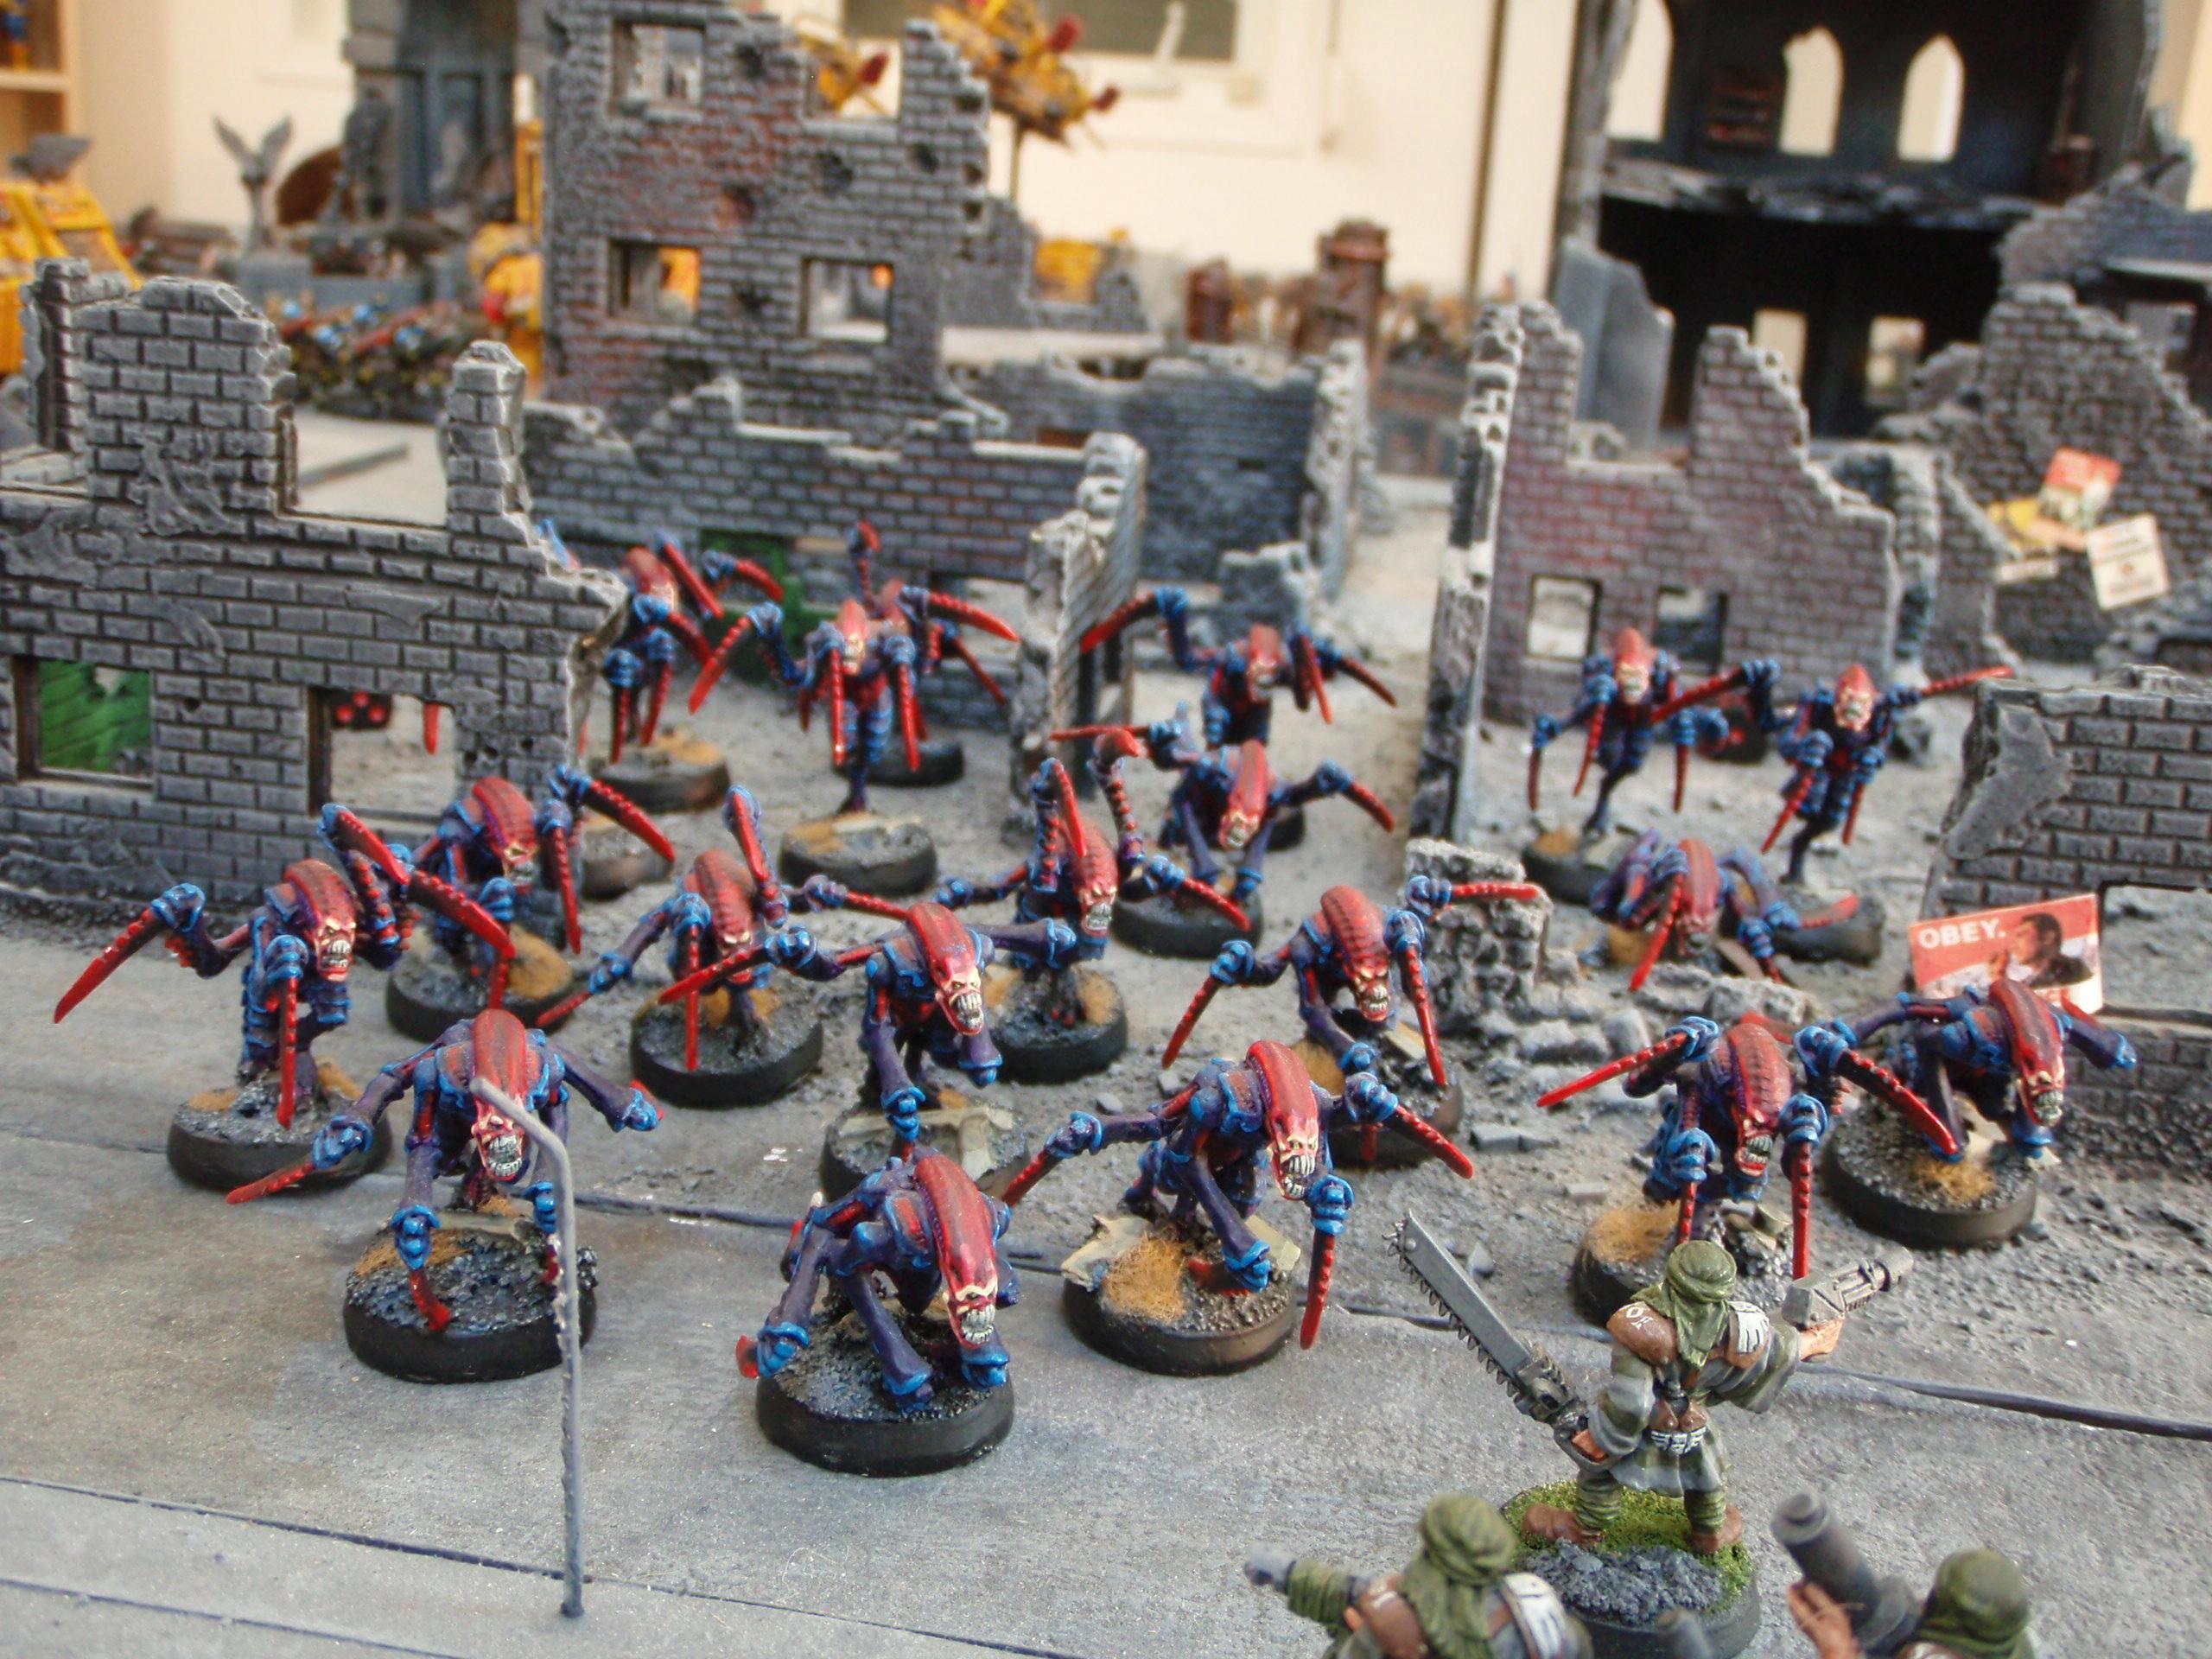 Gaunts, Tyranids, Warhammer 40,000